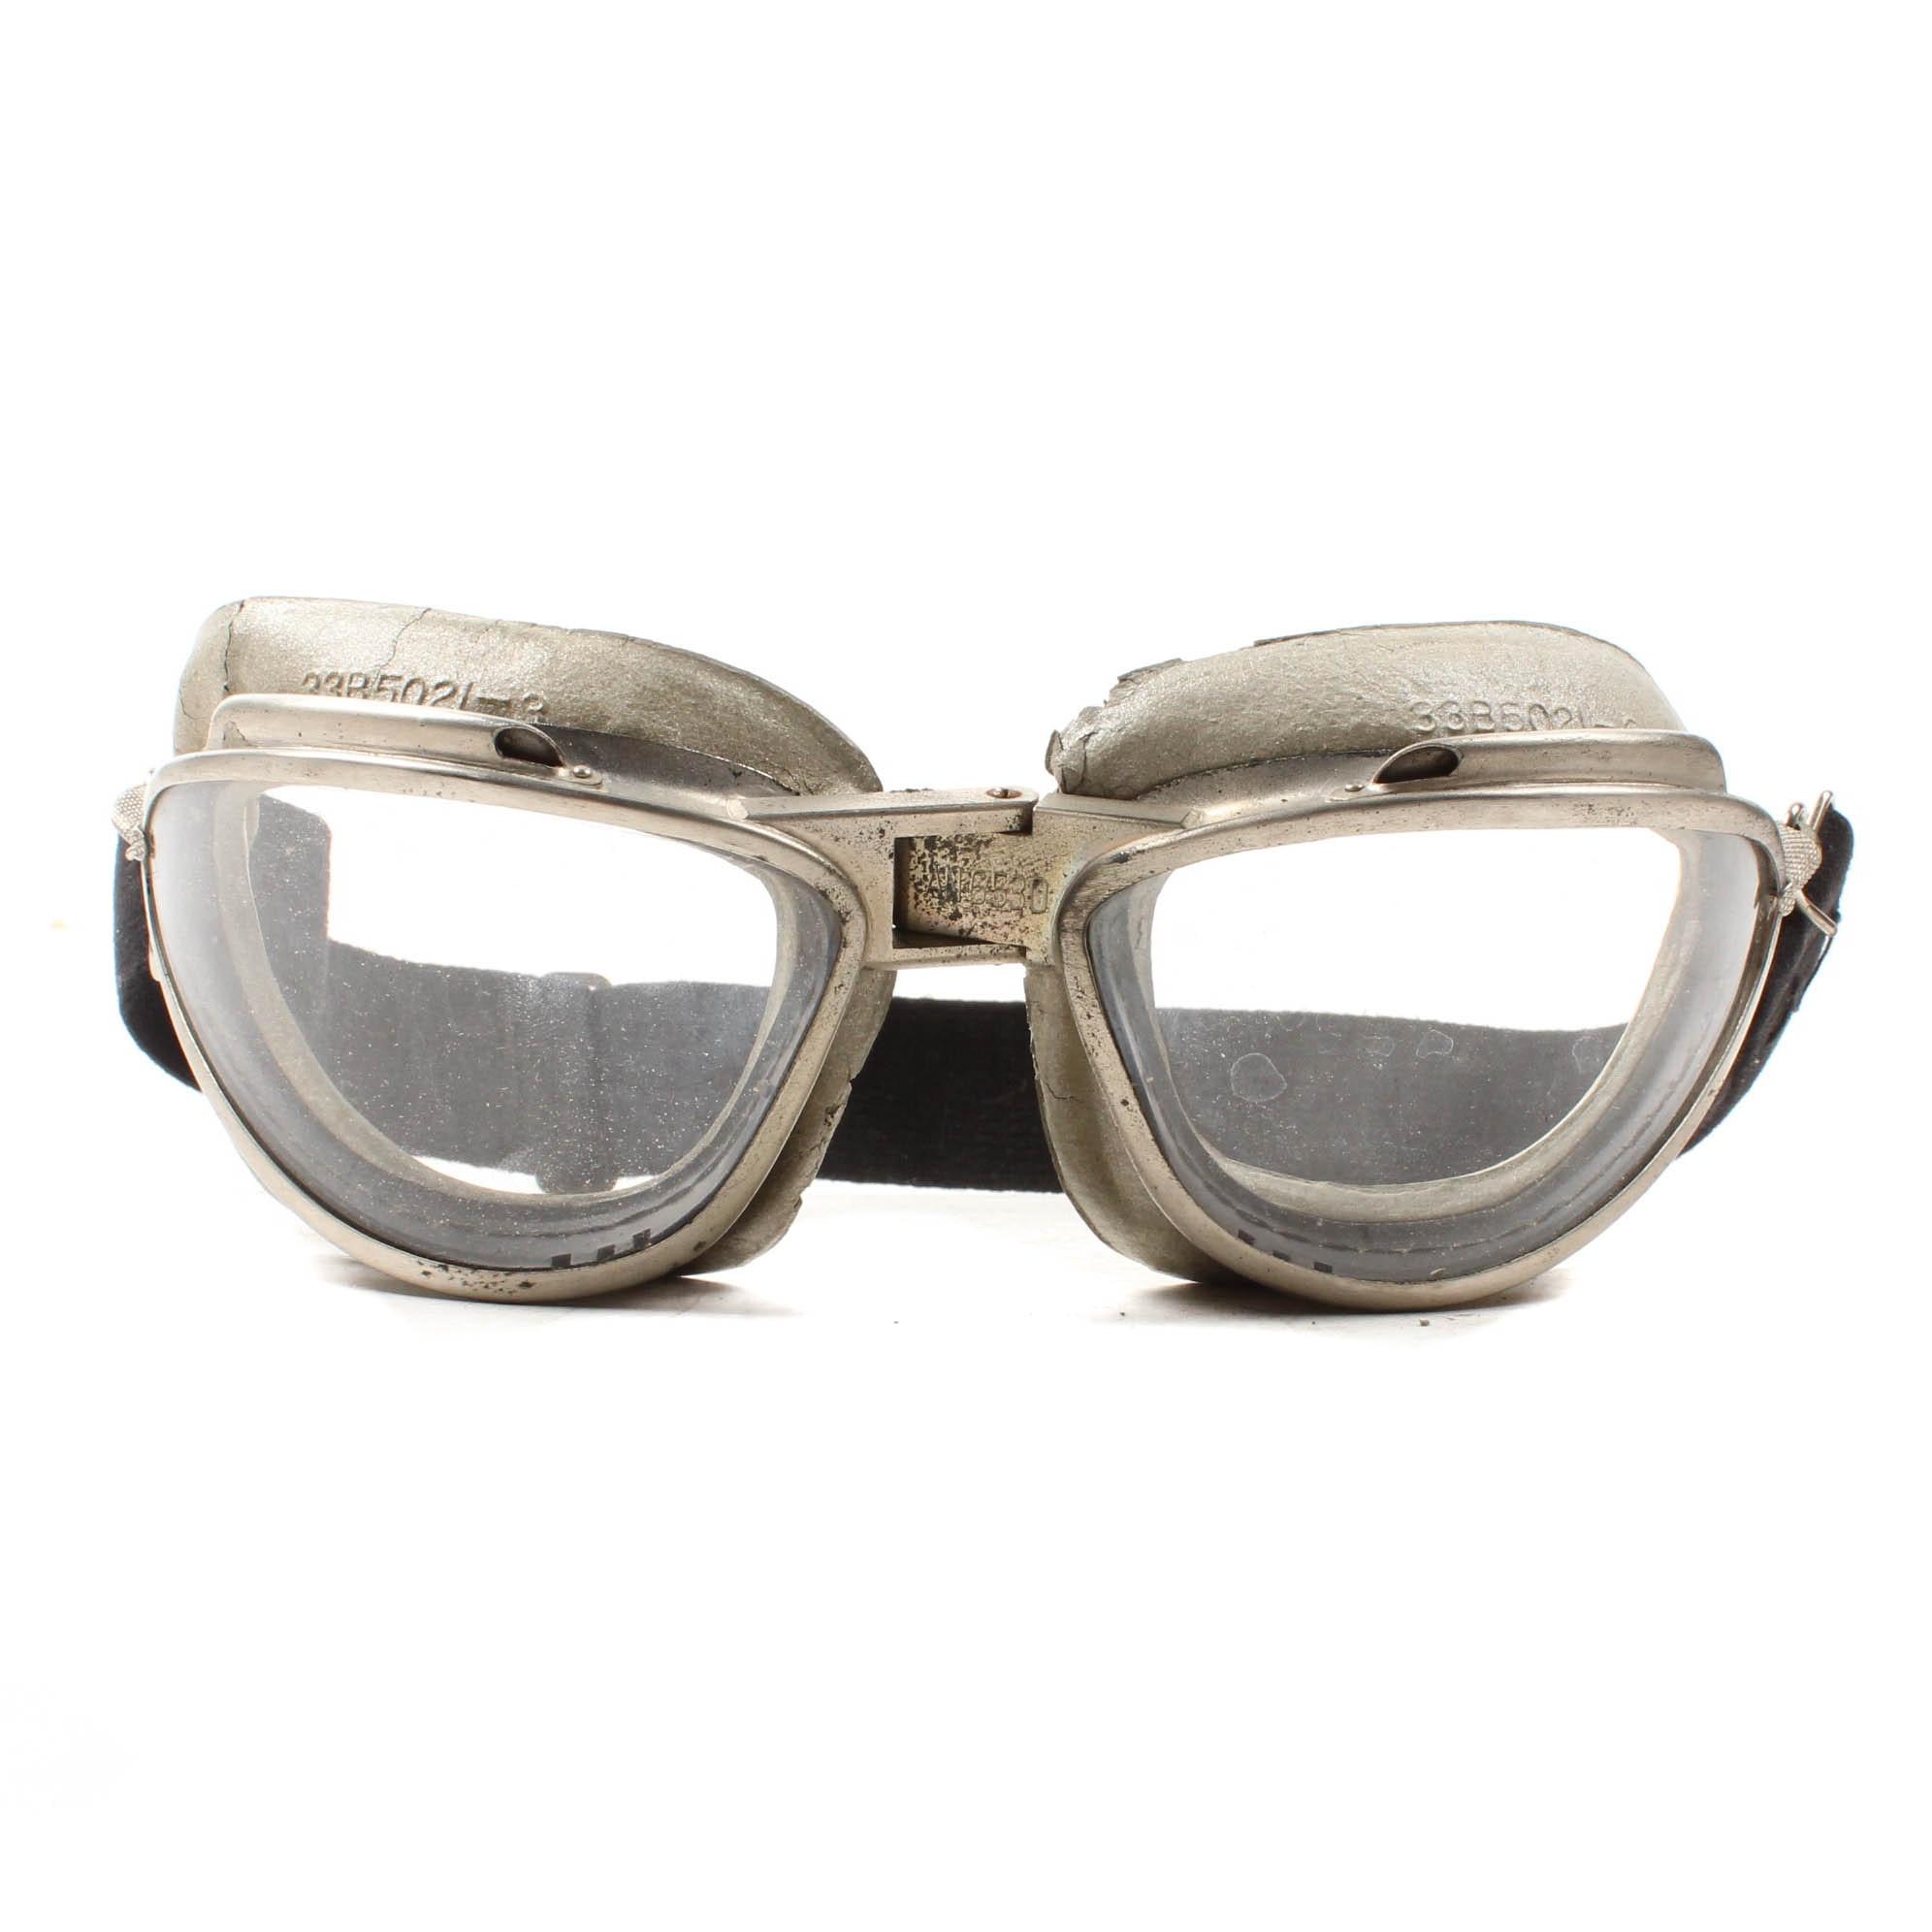 World War II U.S. Air Force Goggles